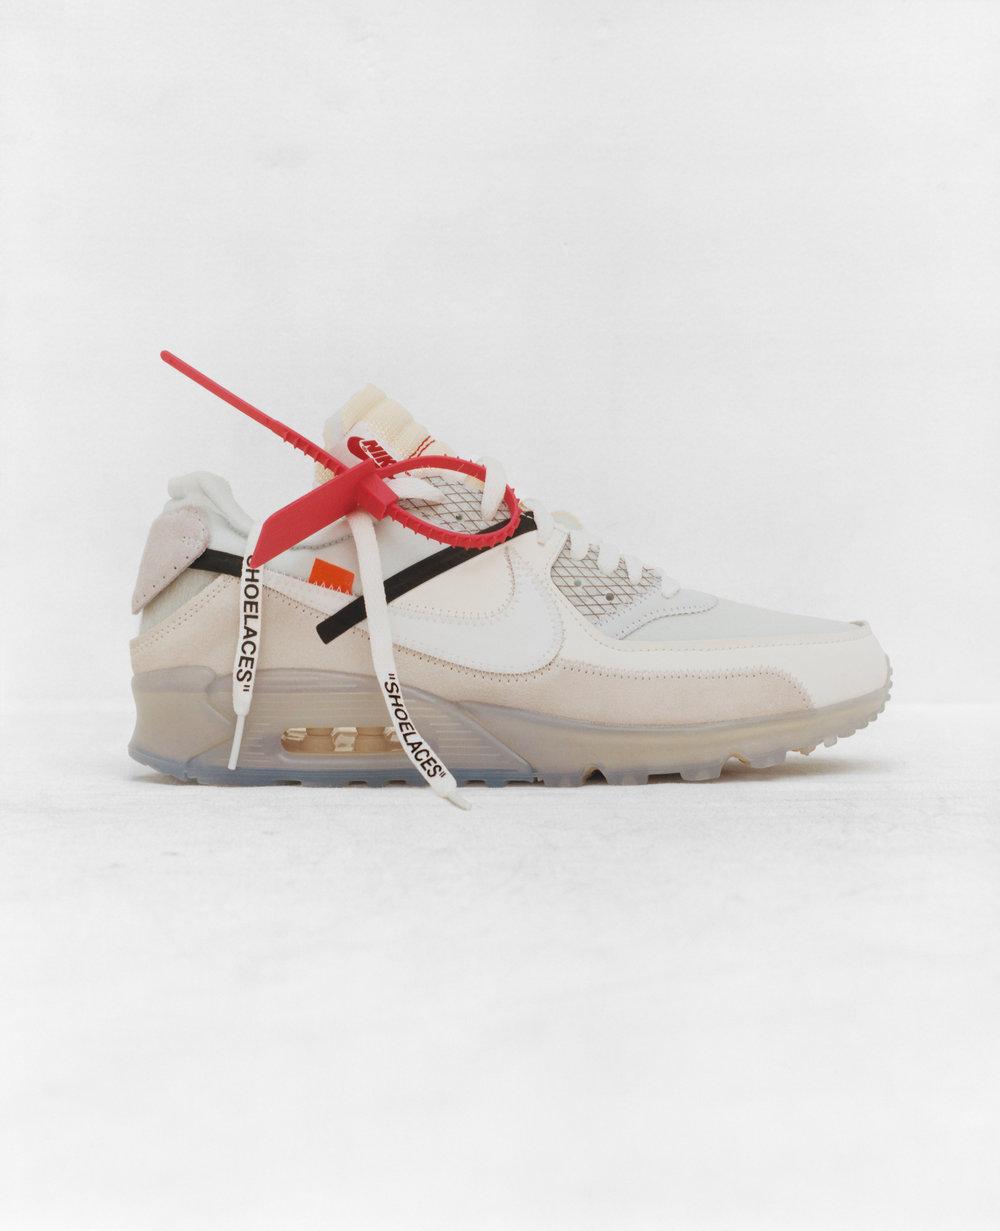 Virgil-Abloh-Nike-The10-6_73190.jpg